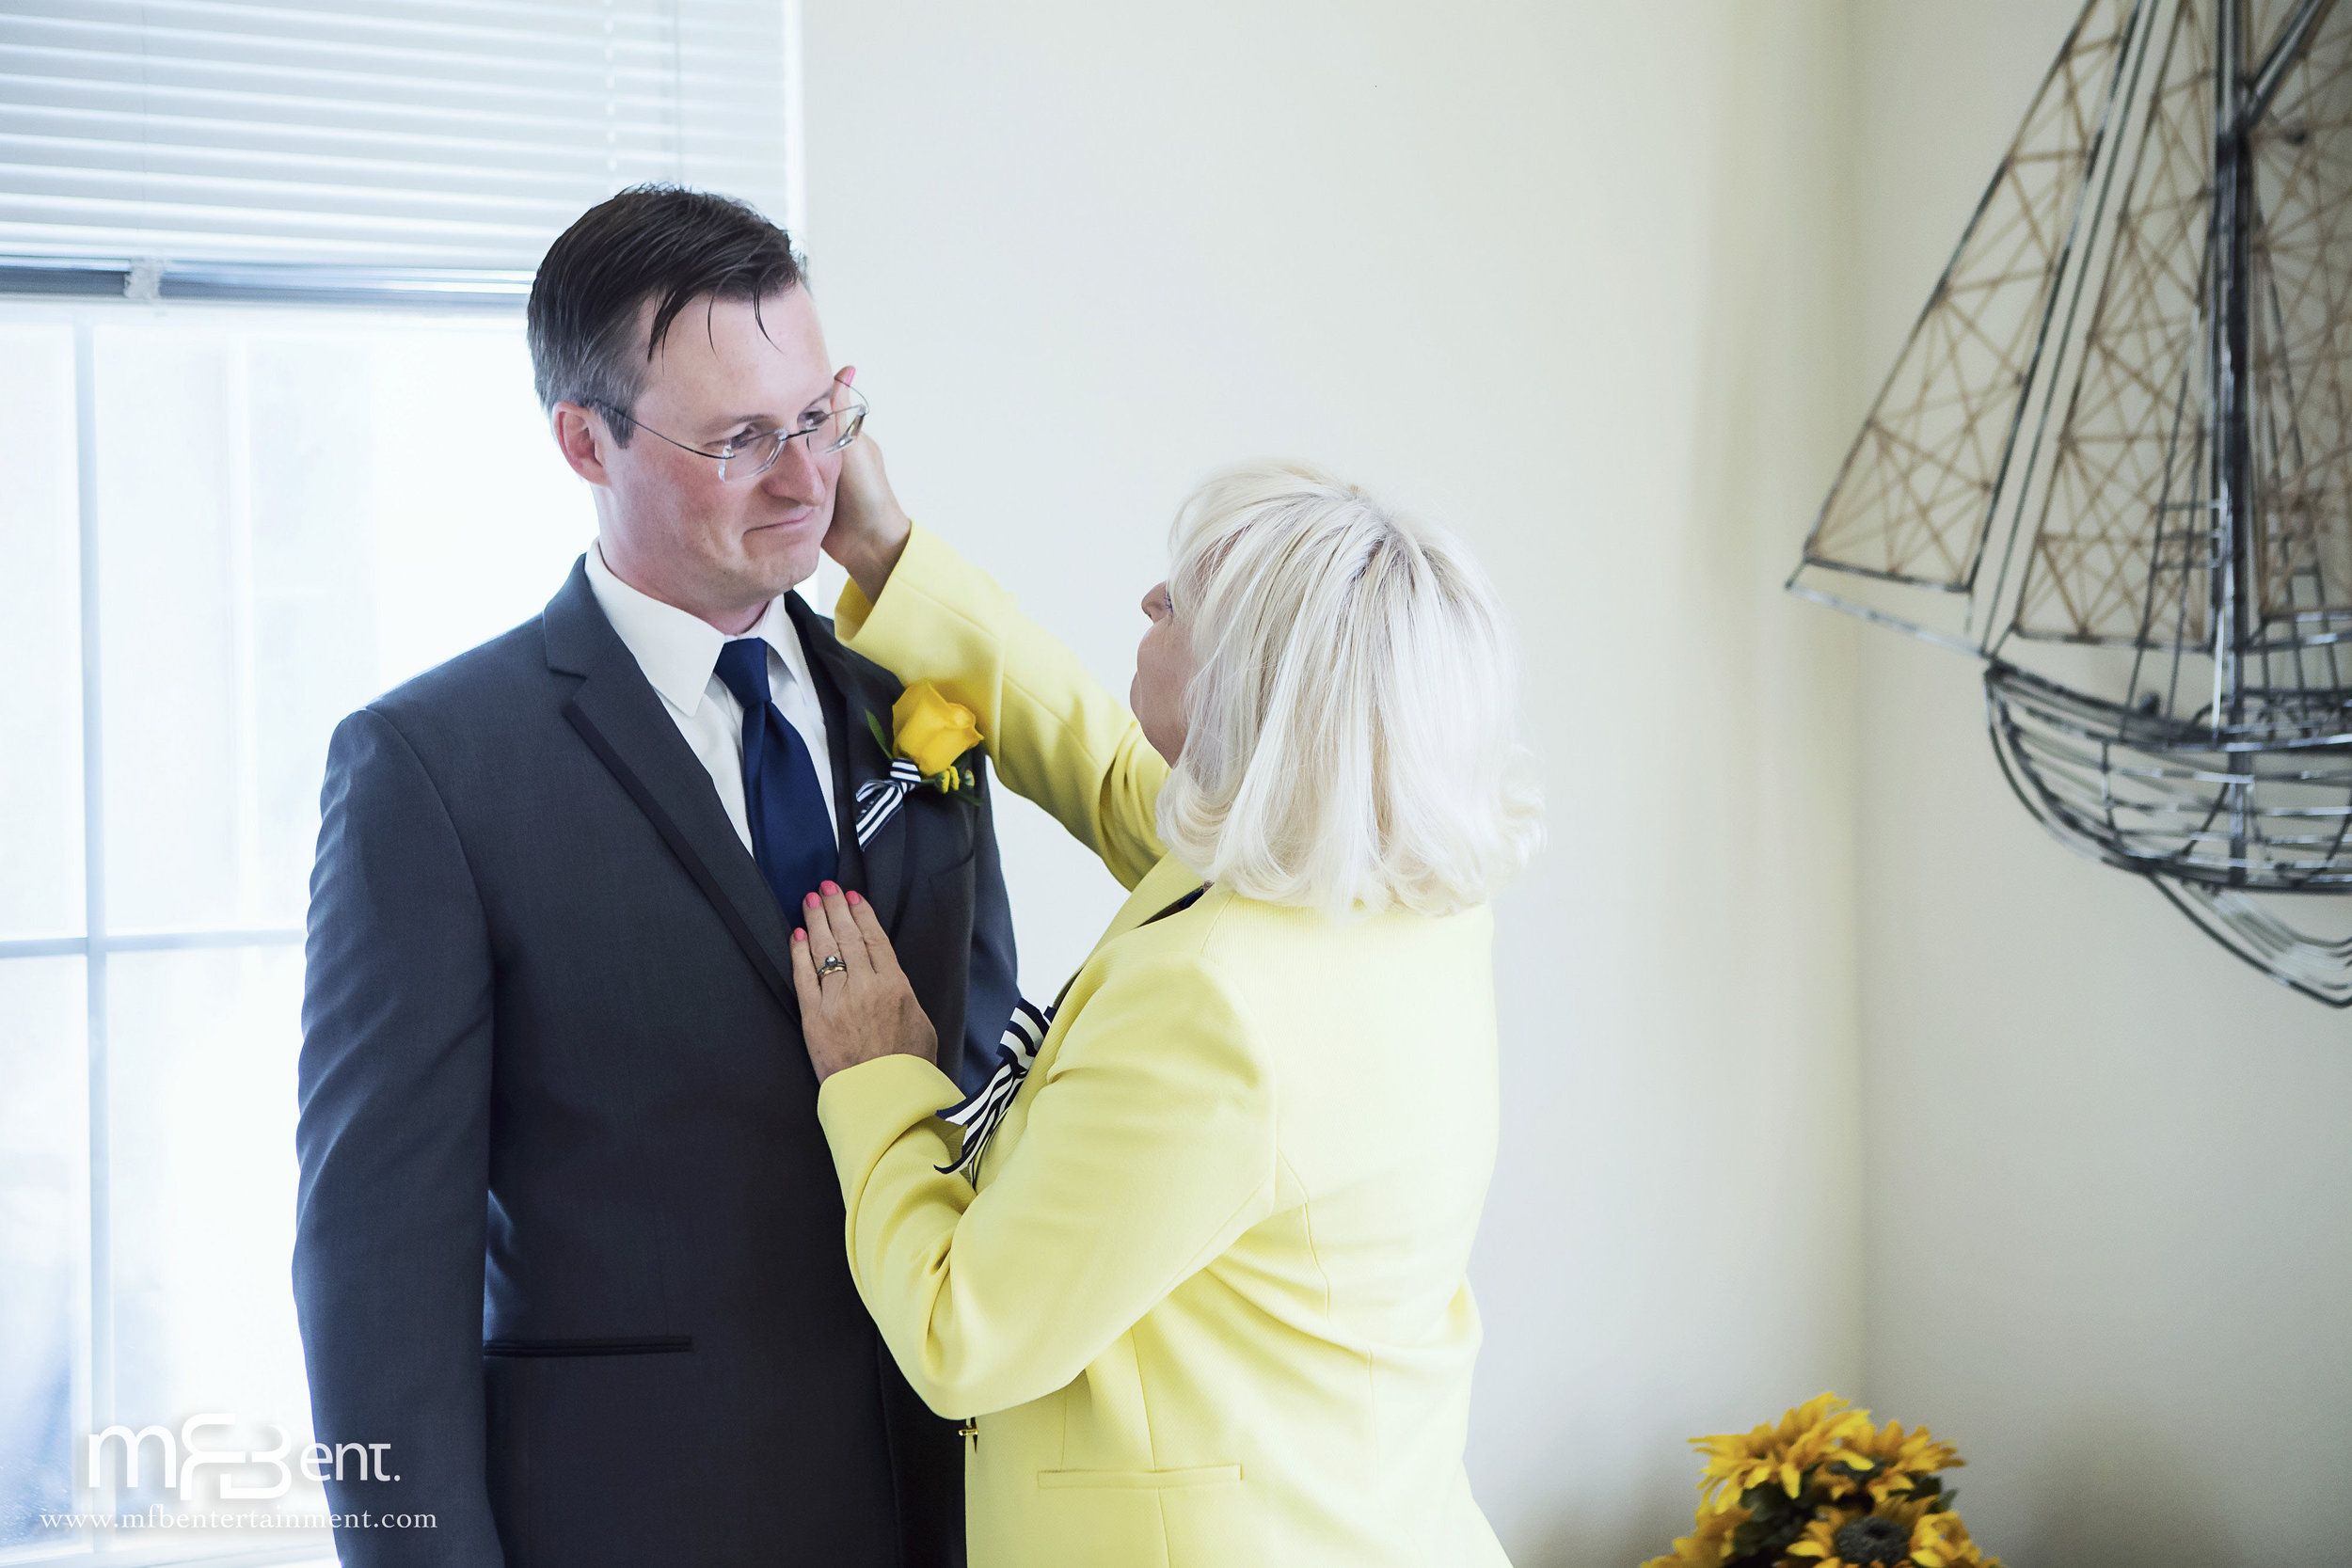 PIOTR CHELSEA WEDDING-PRE CEREMONY-0111 L.jpg